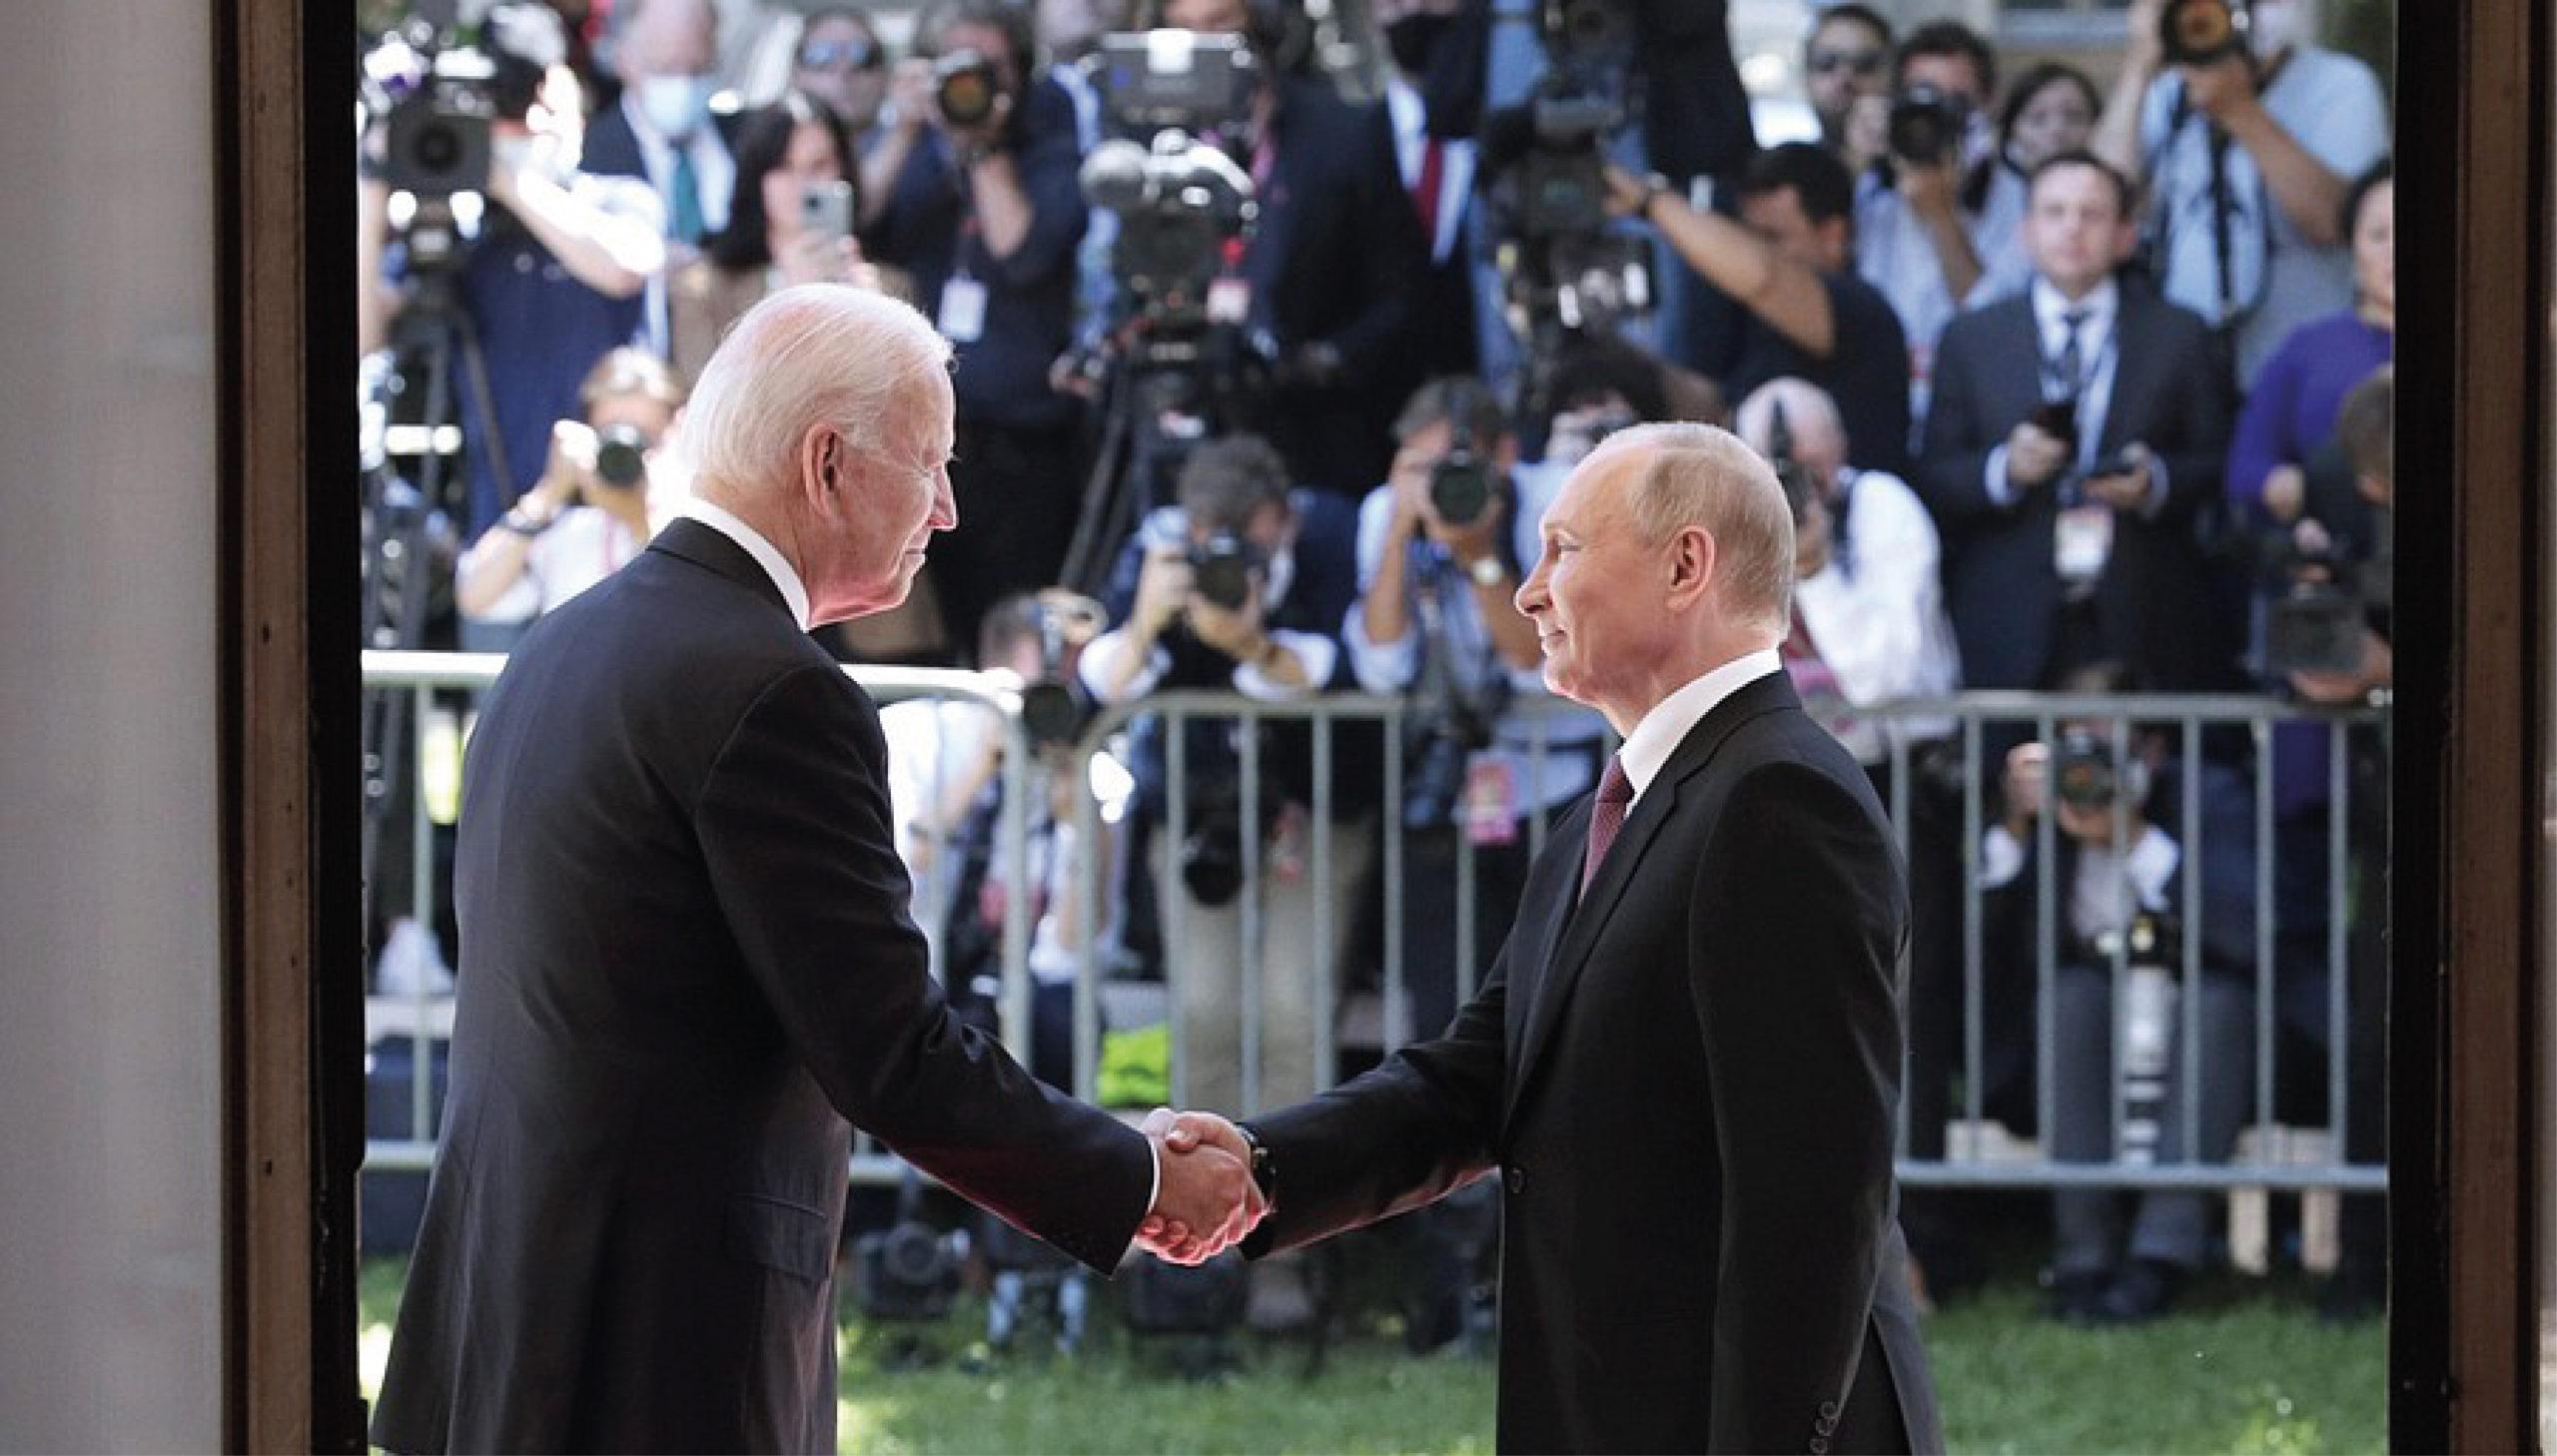 Reporteros protagonizan conato de bronca en cumbre Biden-Putin